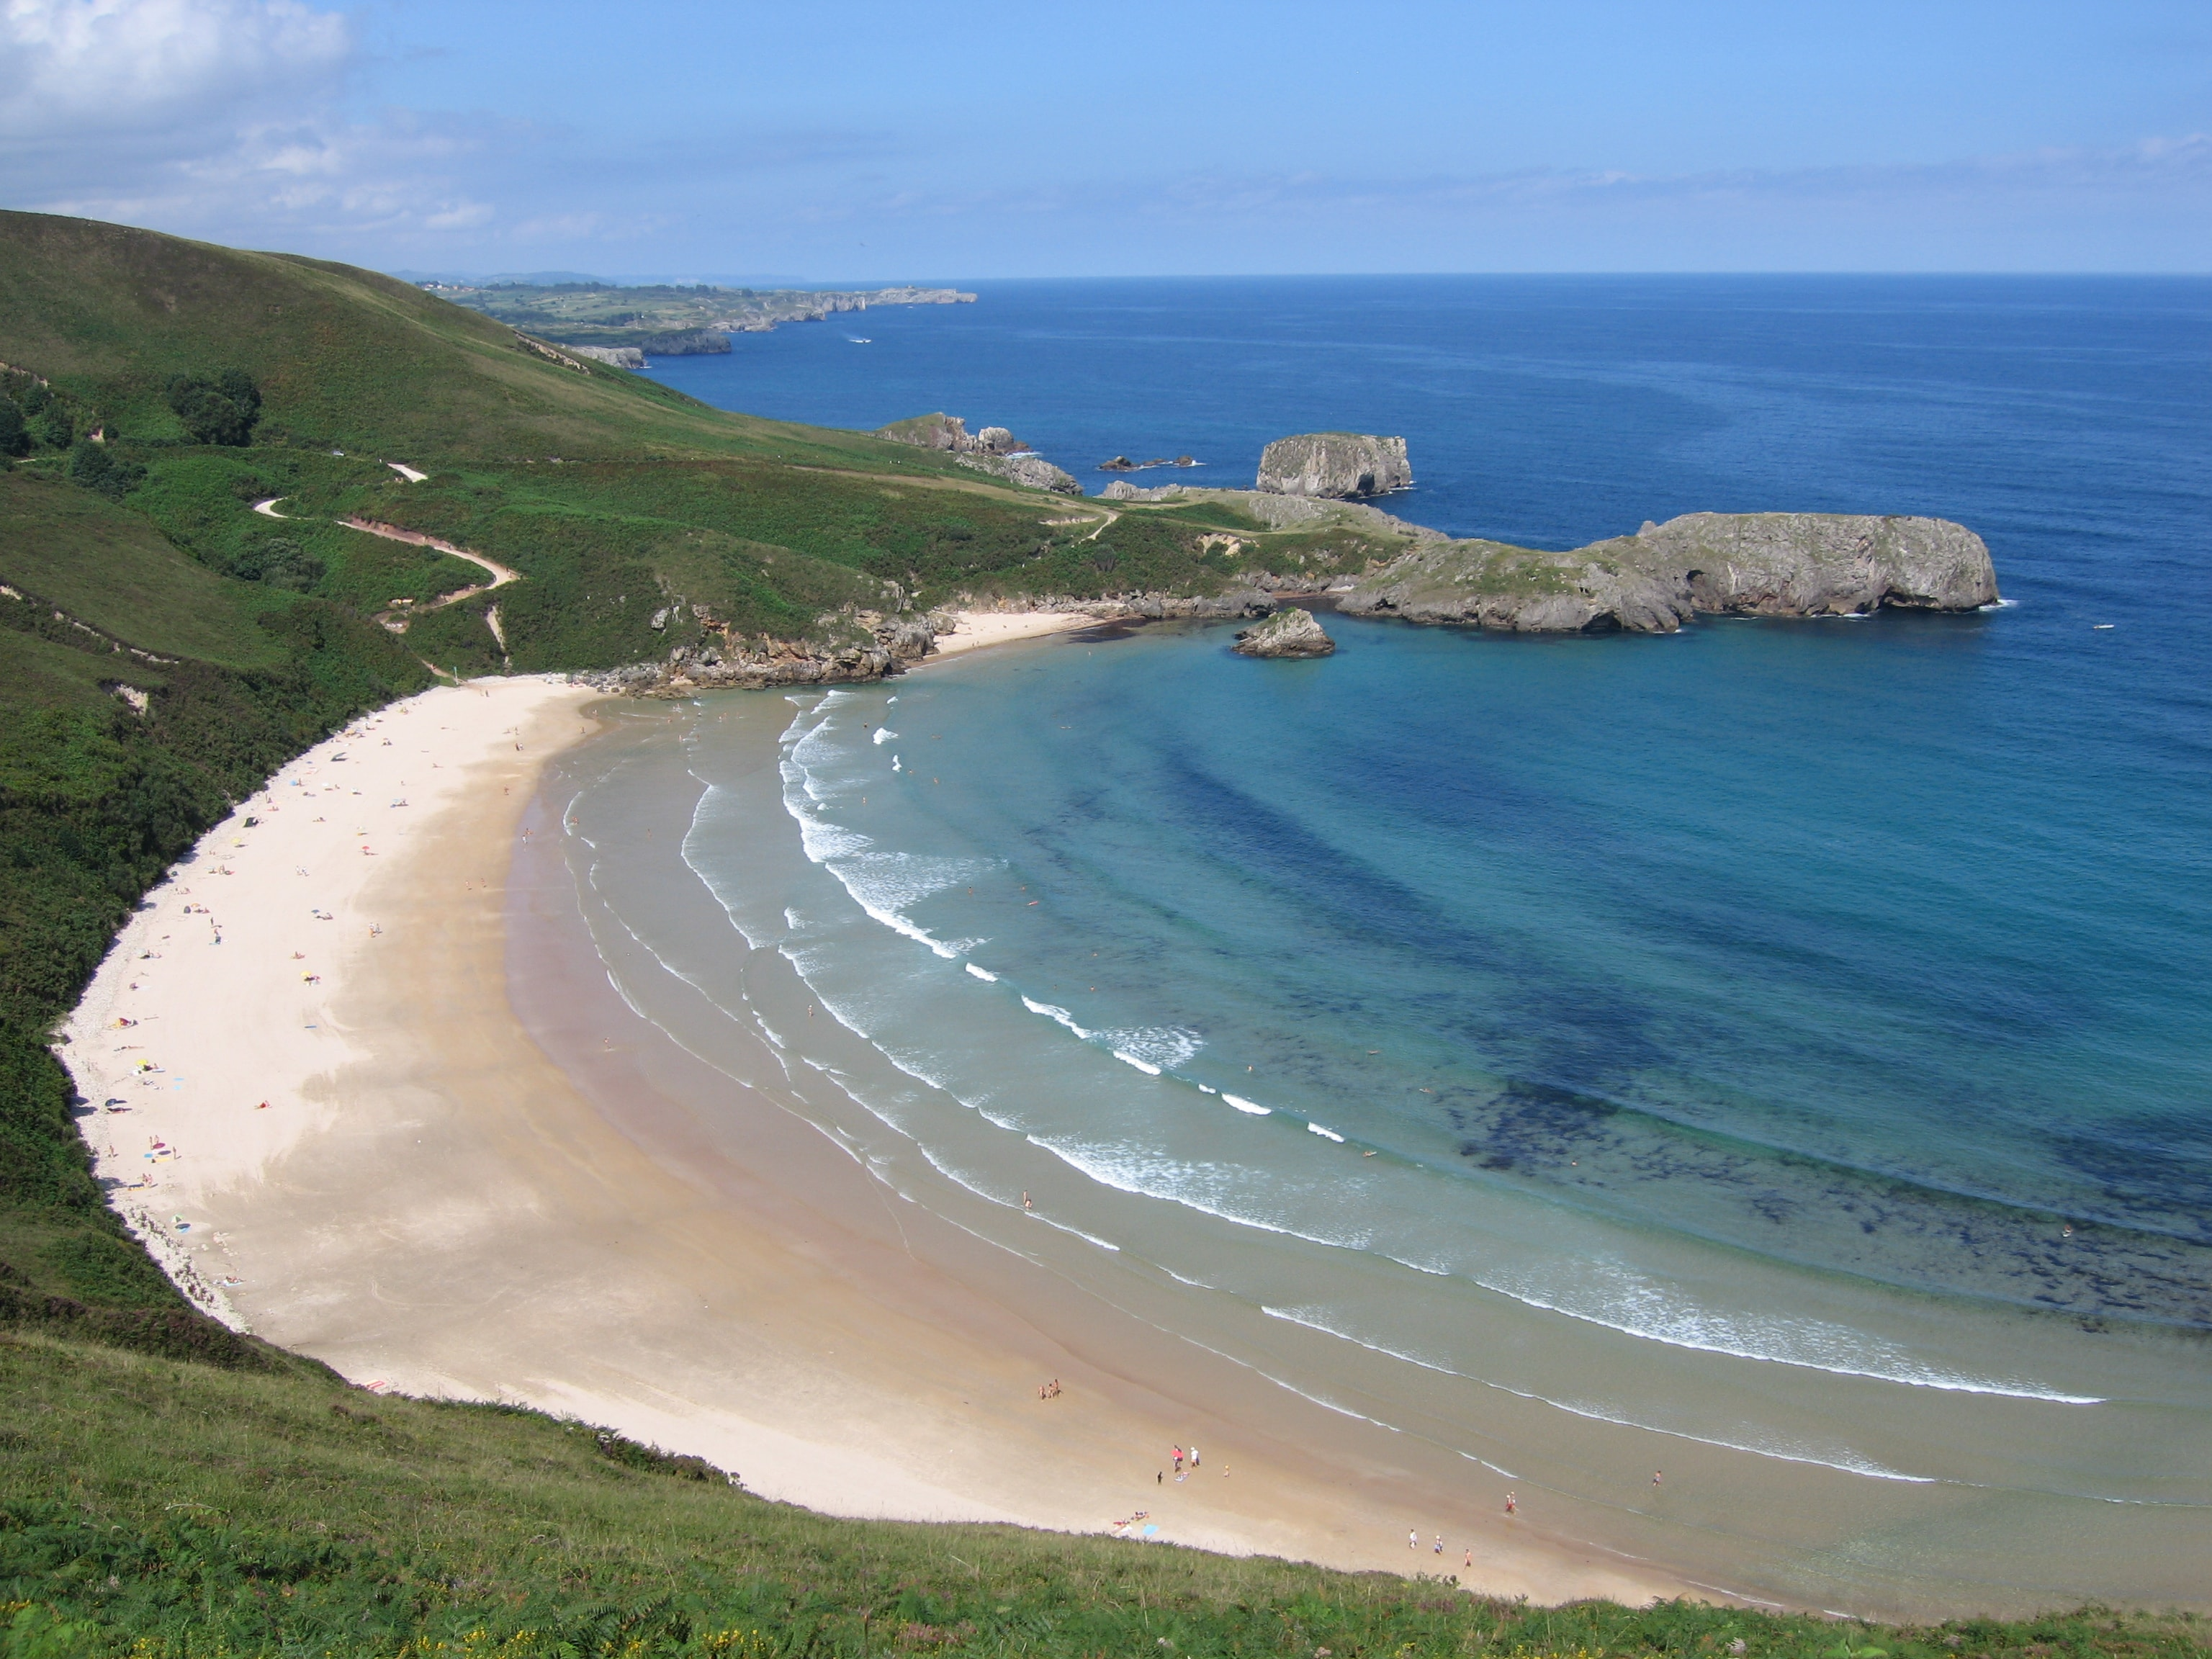 mejores playas españa torimbia